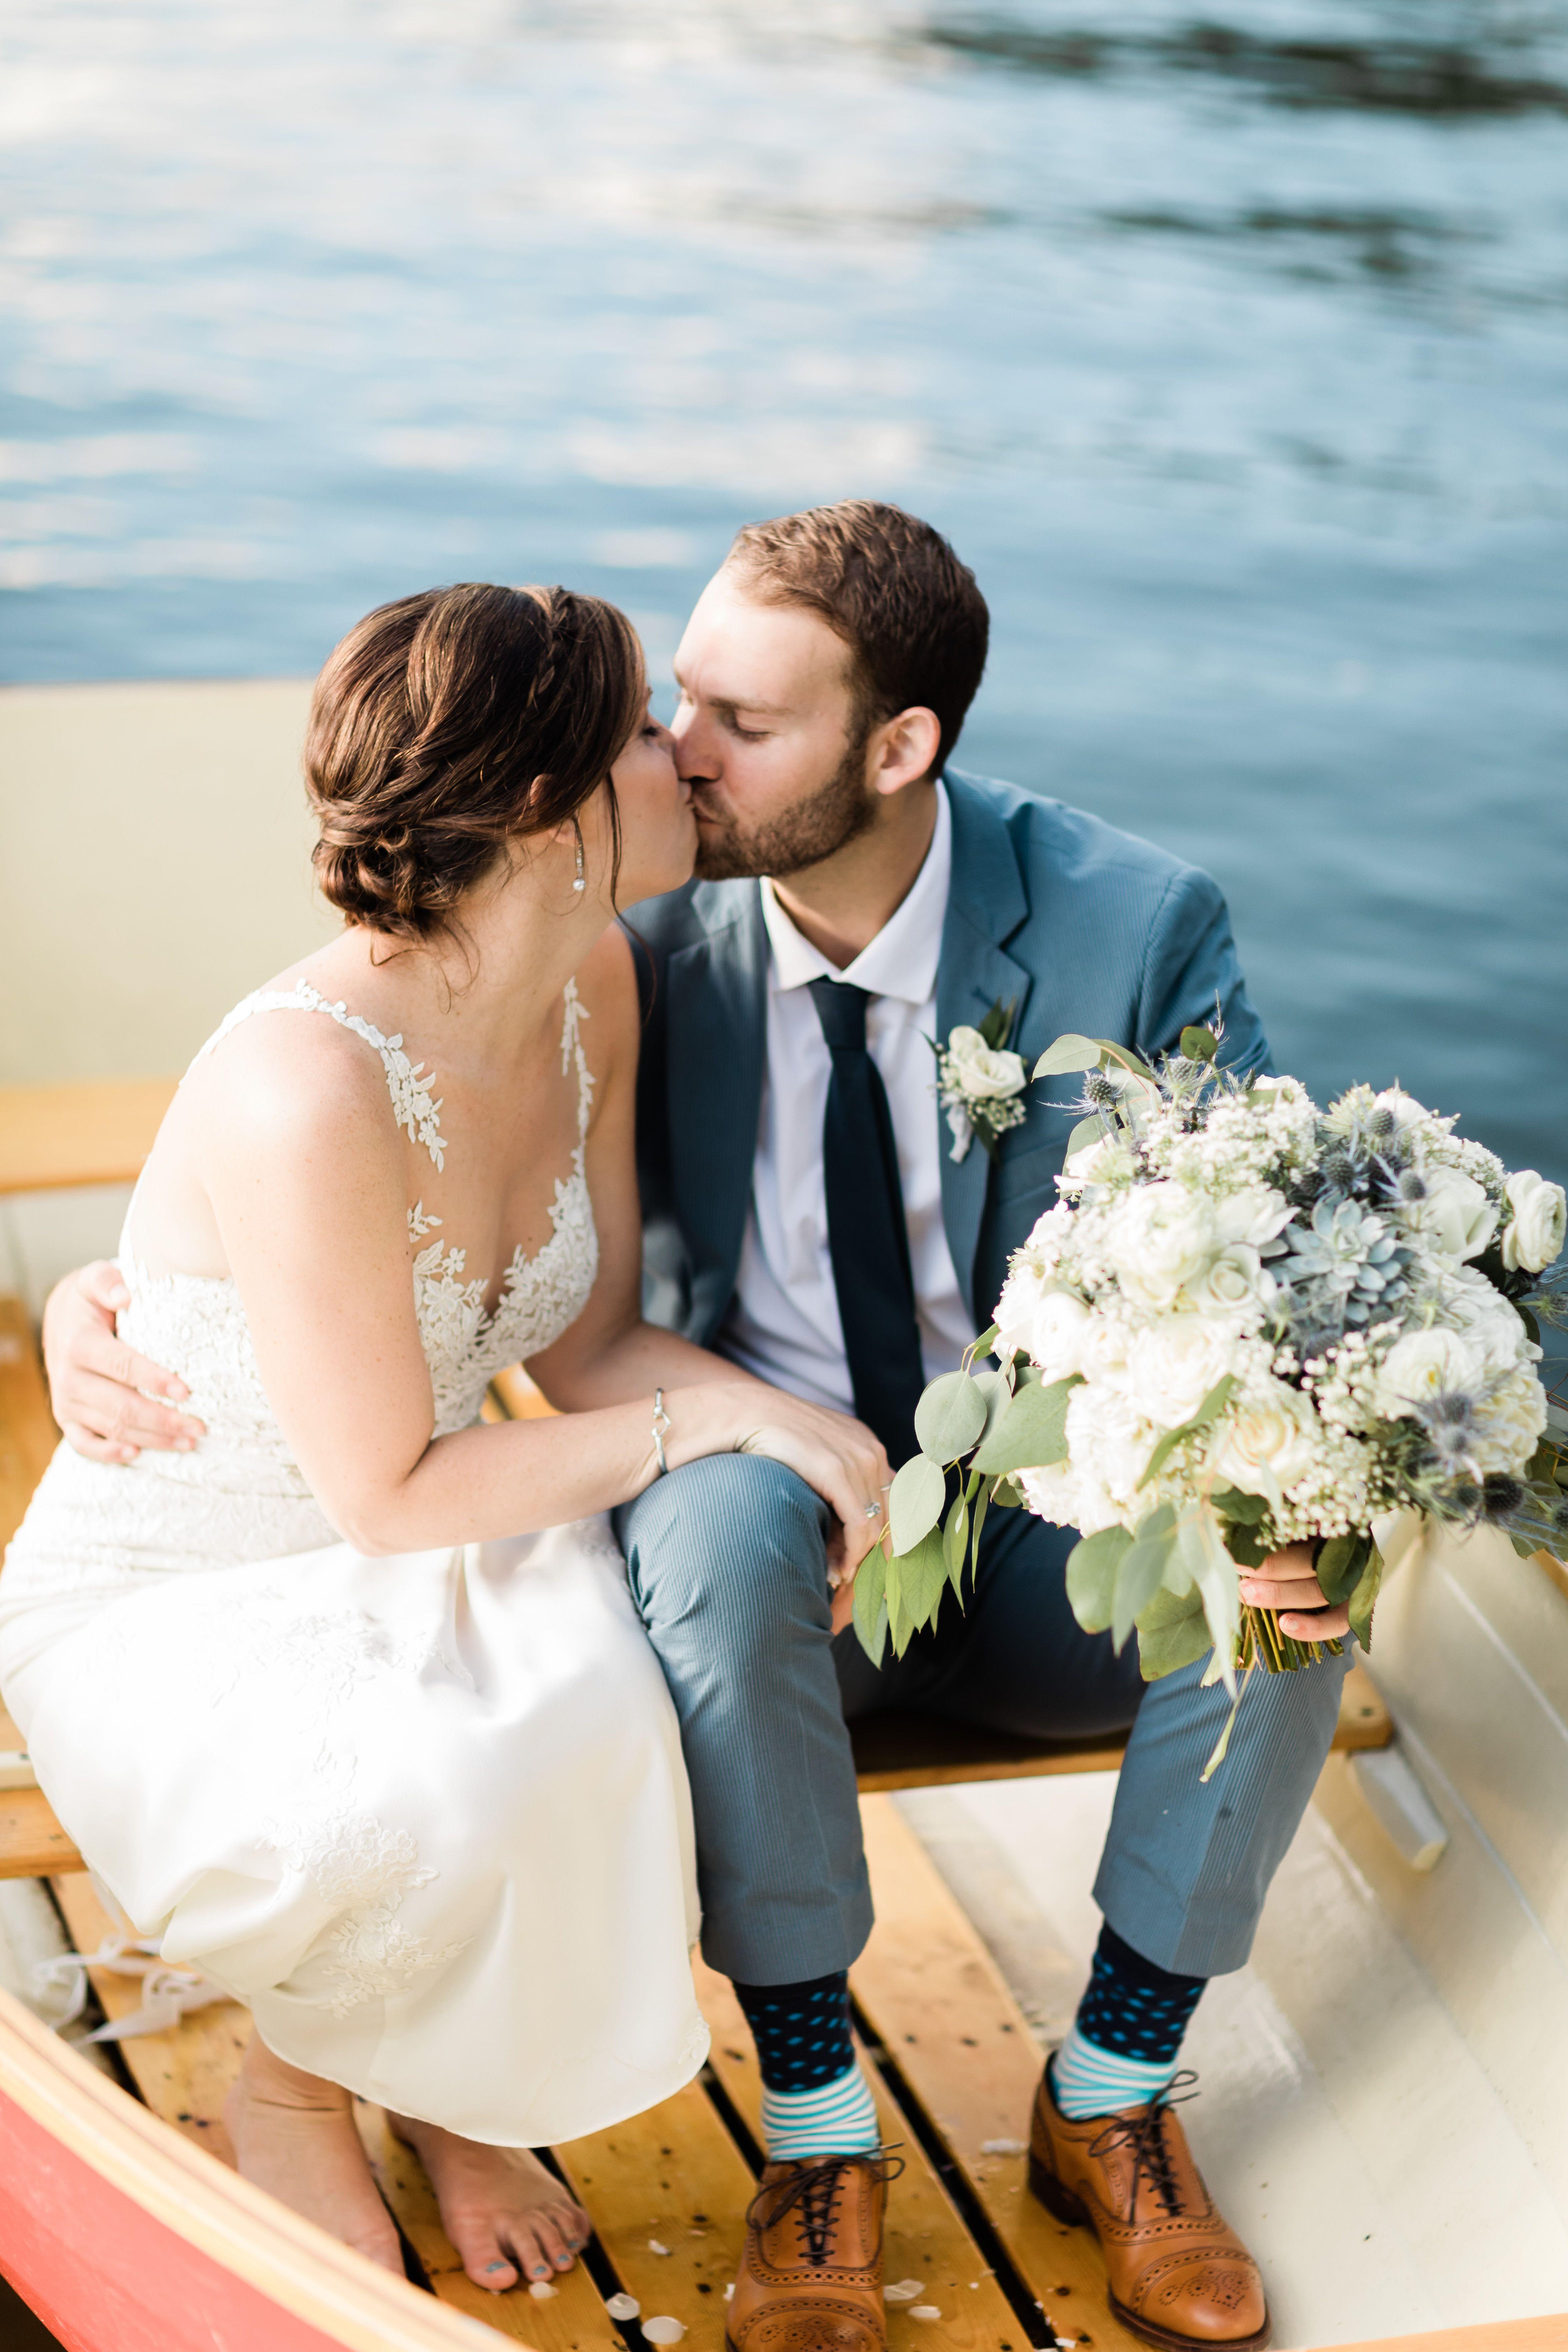 Wedding photography, Winter wedding